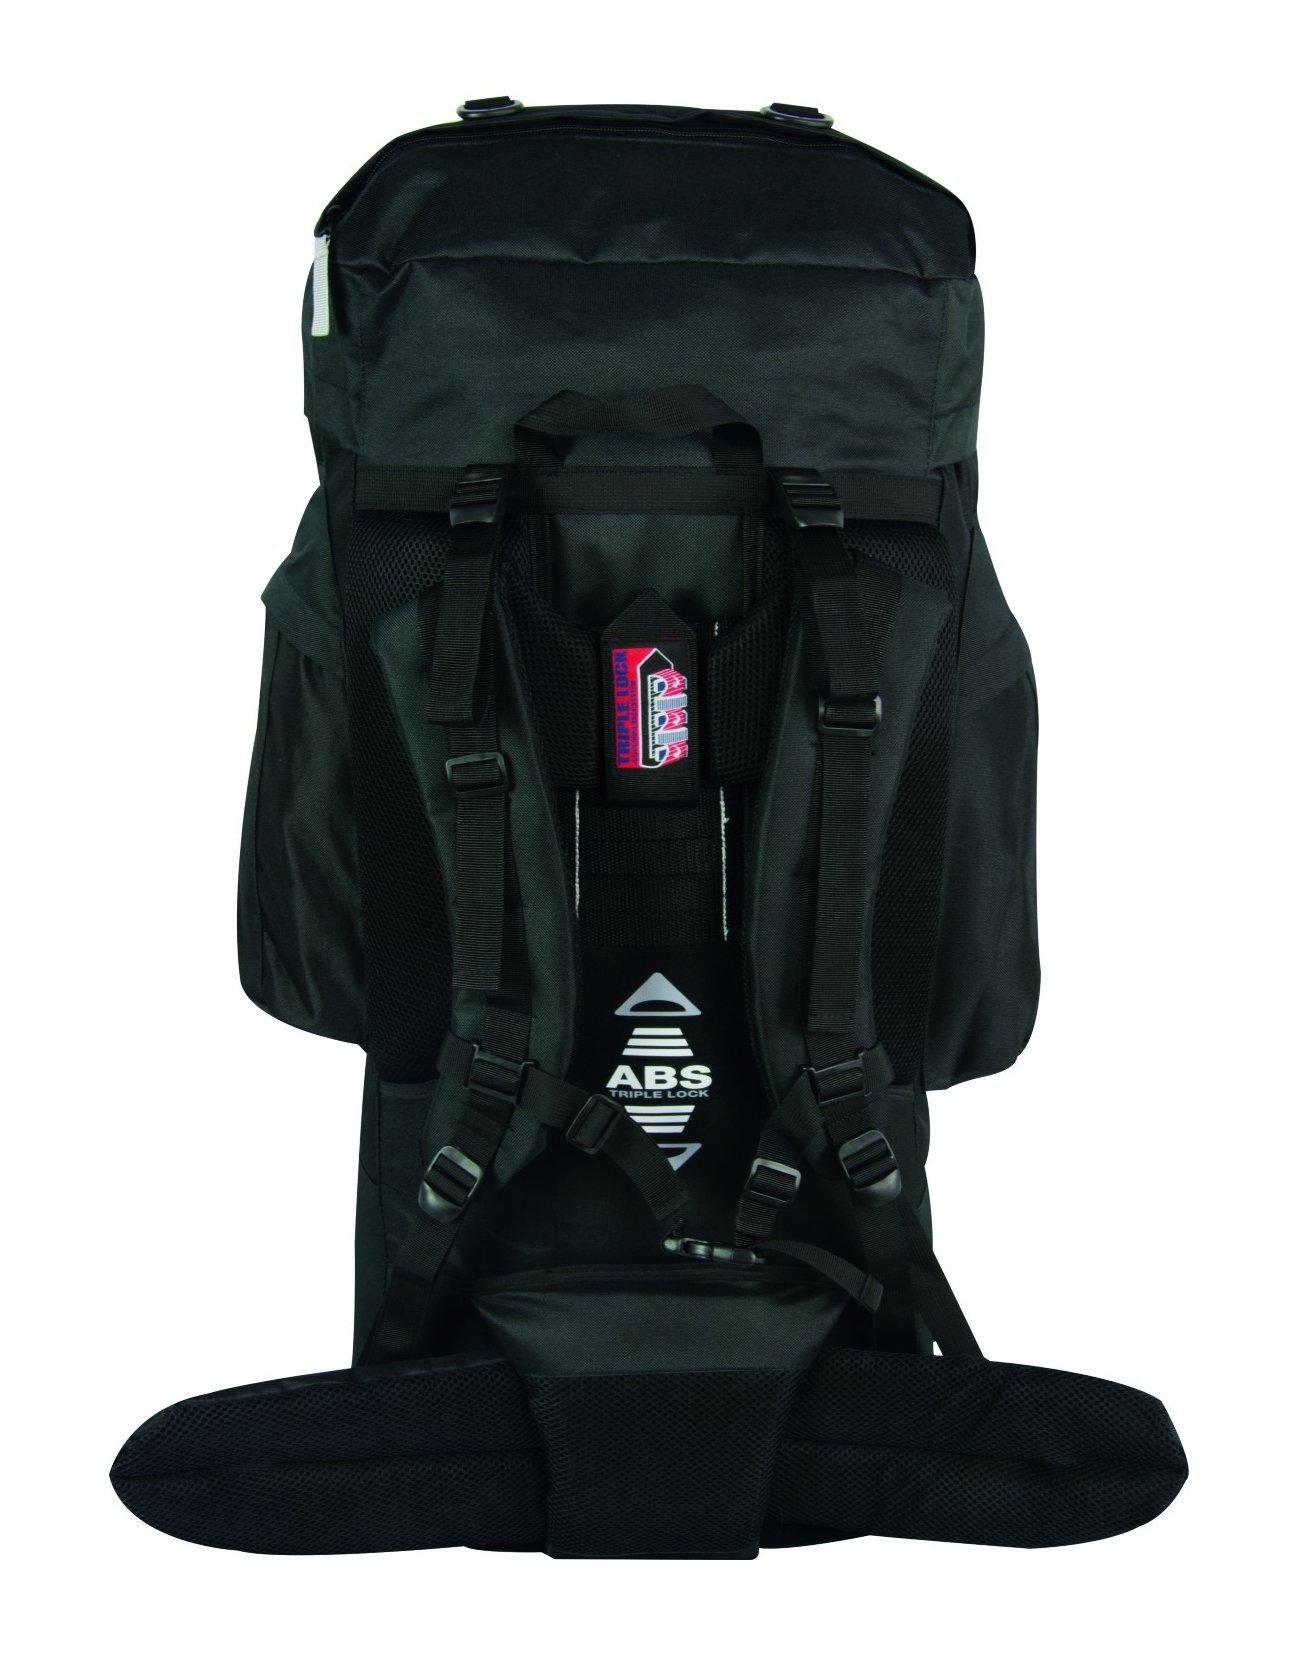 Highlander Rambler Rucksack ― Small, Medium & Large Unisex Backpacks for Men & Women Hiking, Rambling, Backpacking… 2